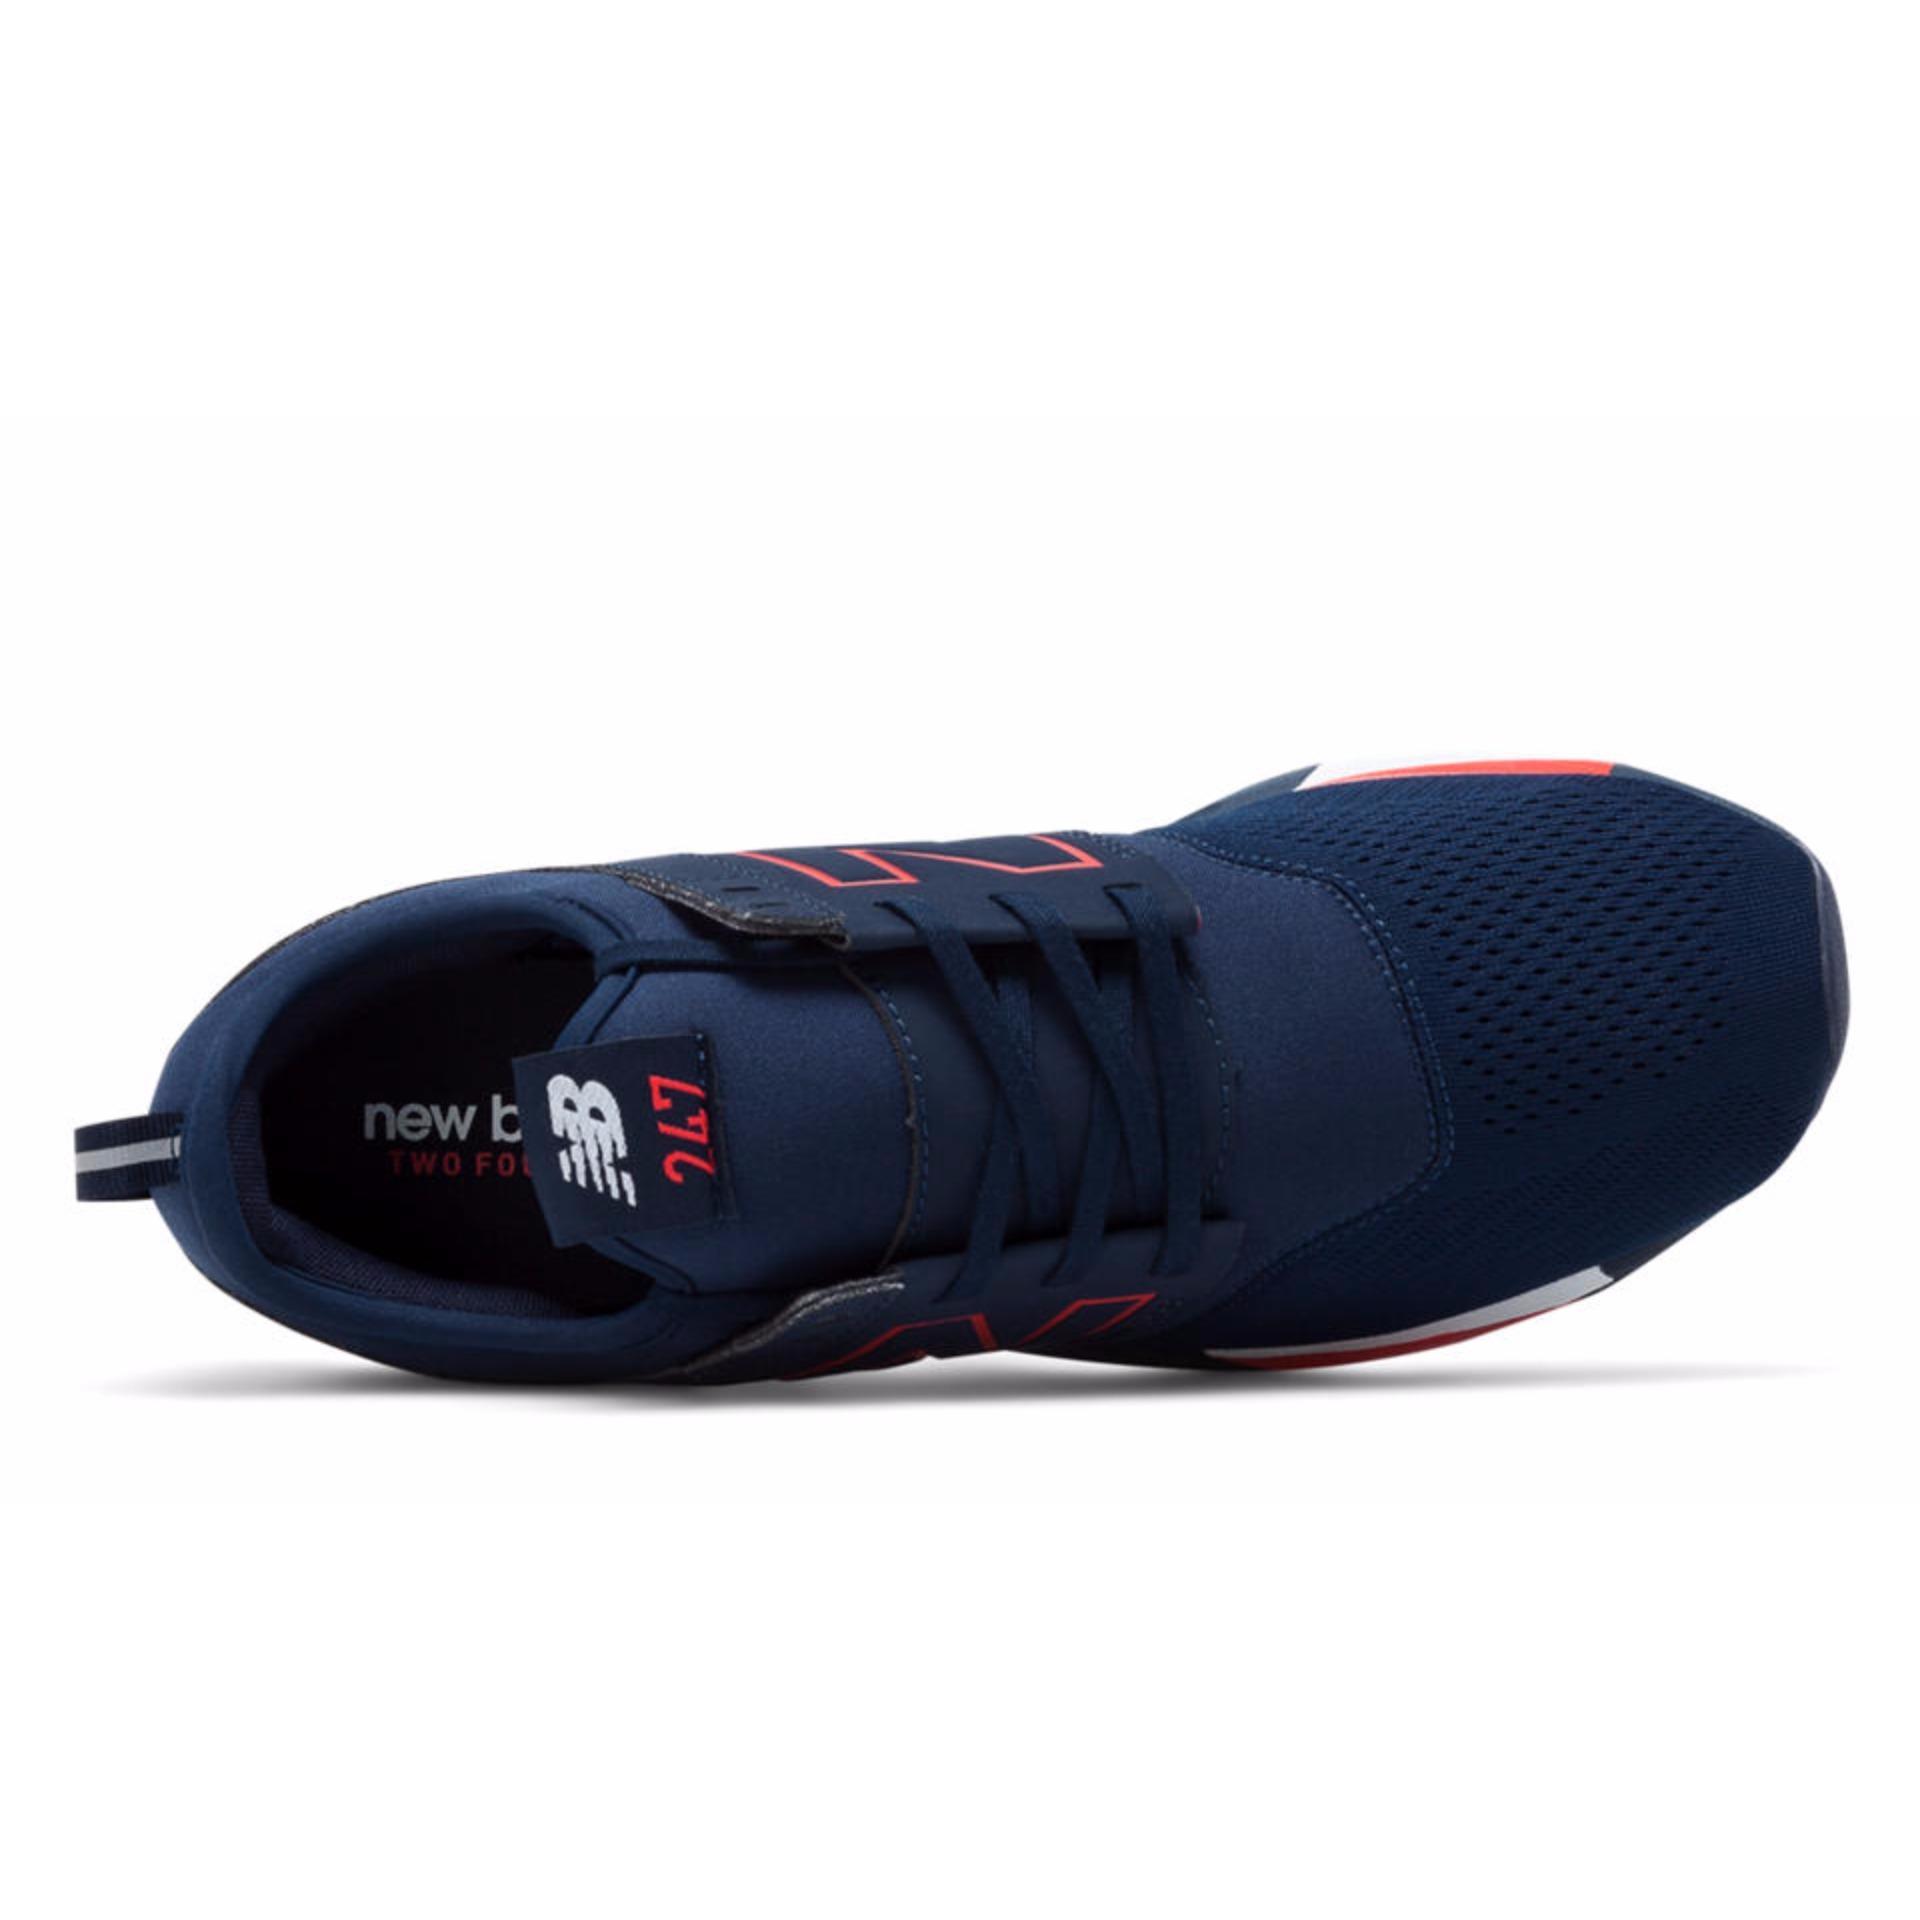 New Balance 247 Classic - Sepatu Pria - Navy .